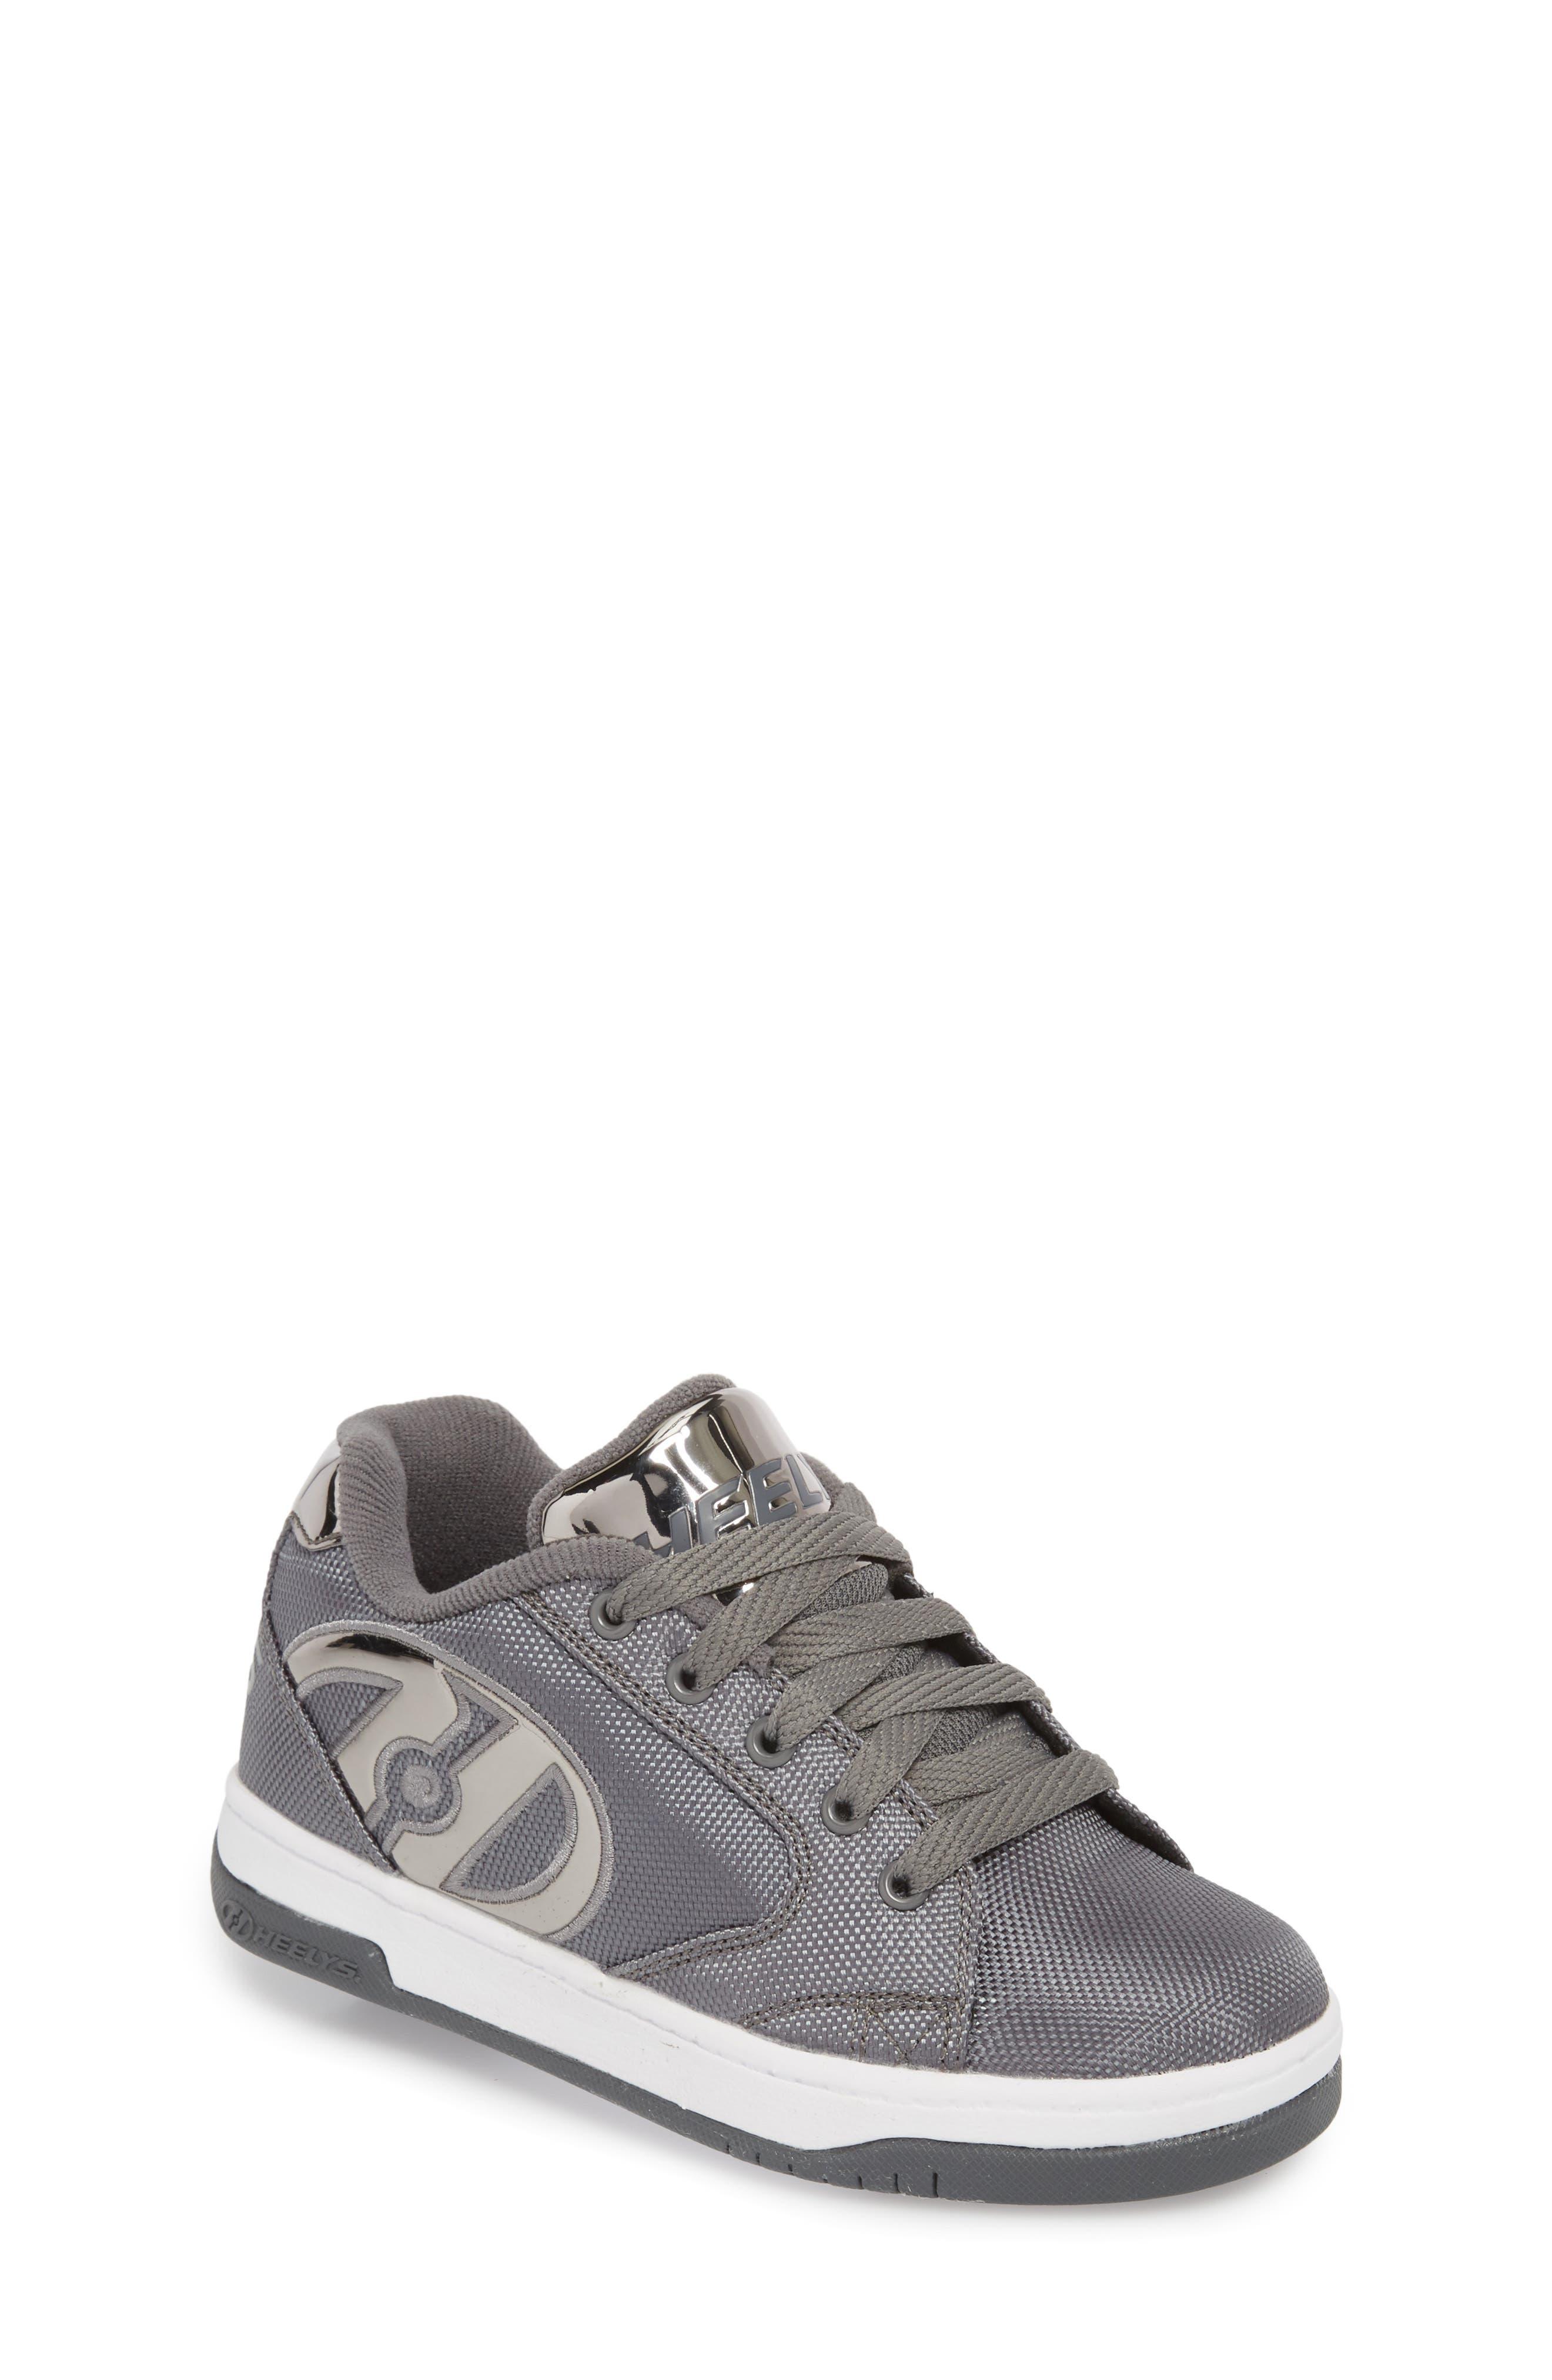 Heels Propel Ballistic Sneaker,                             Main thumbnail 1, color,                             Charcoal/ Pewter